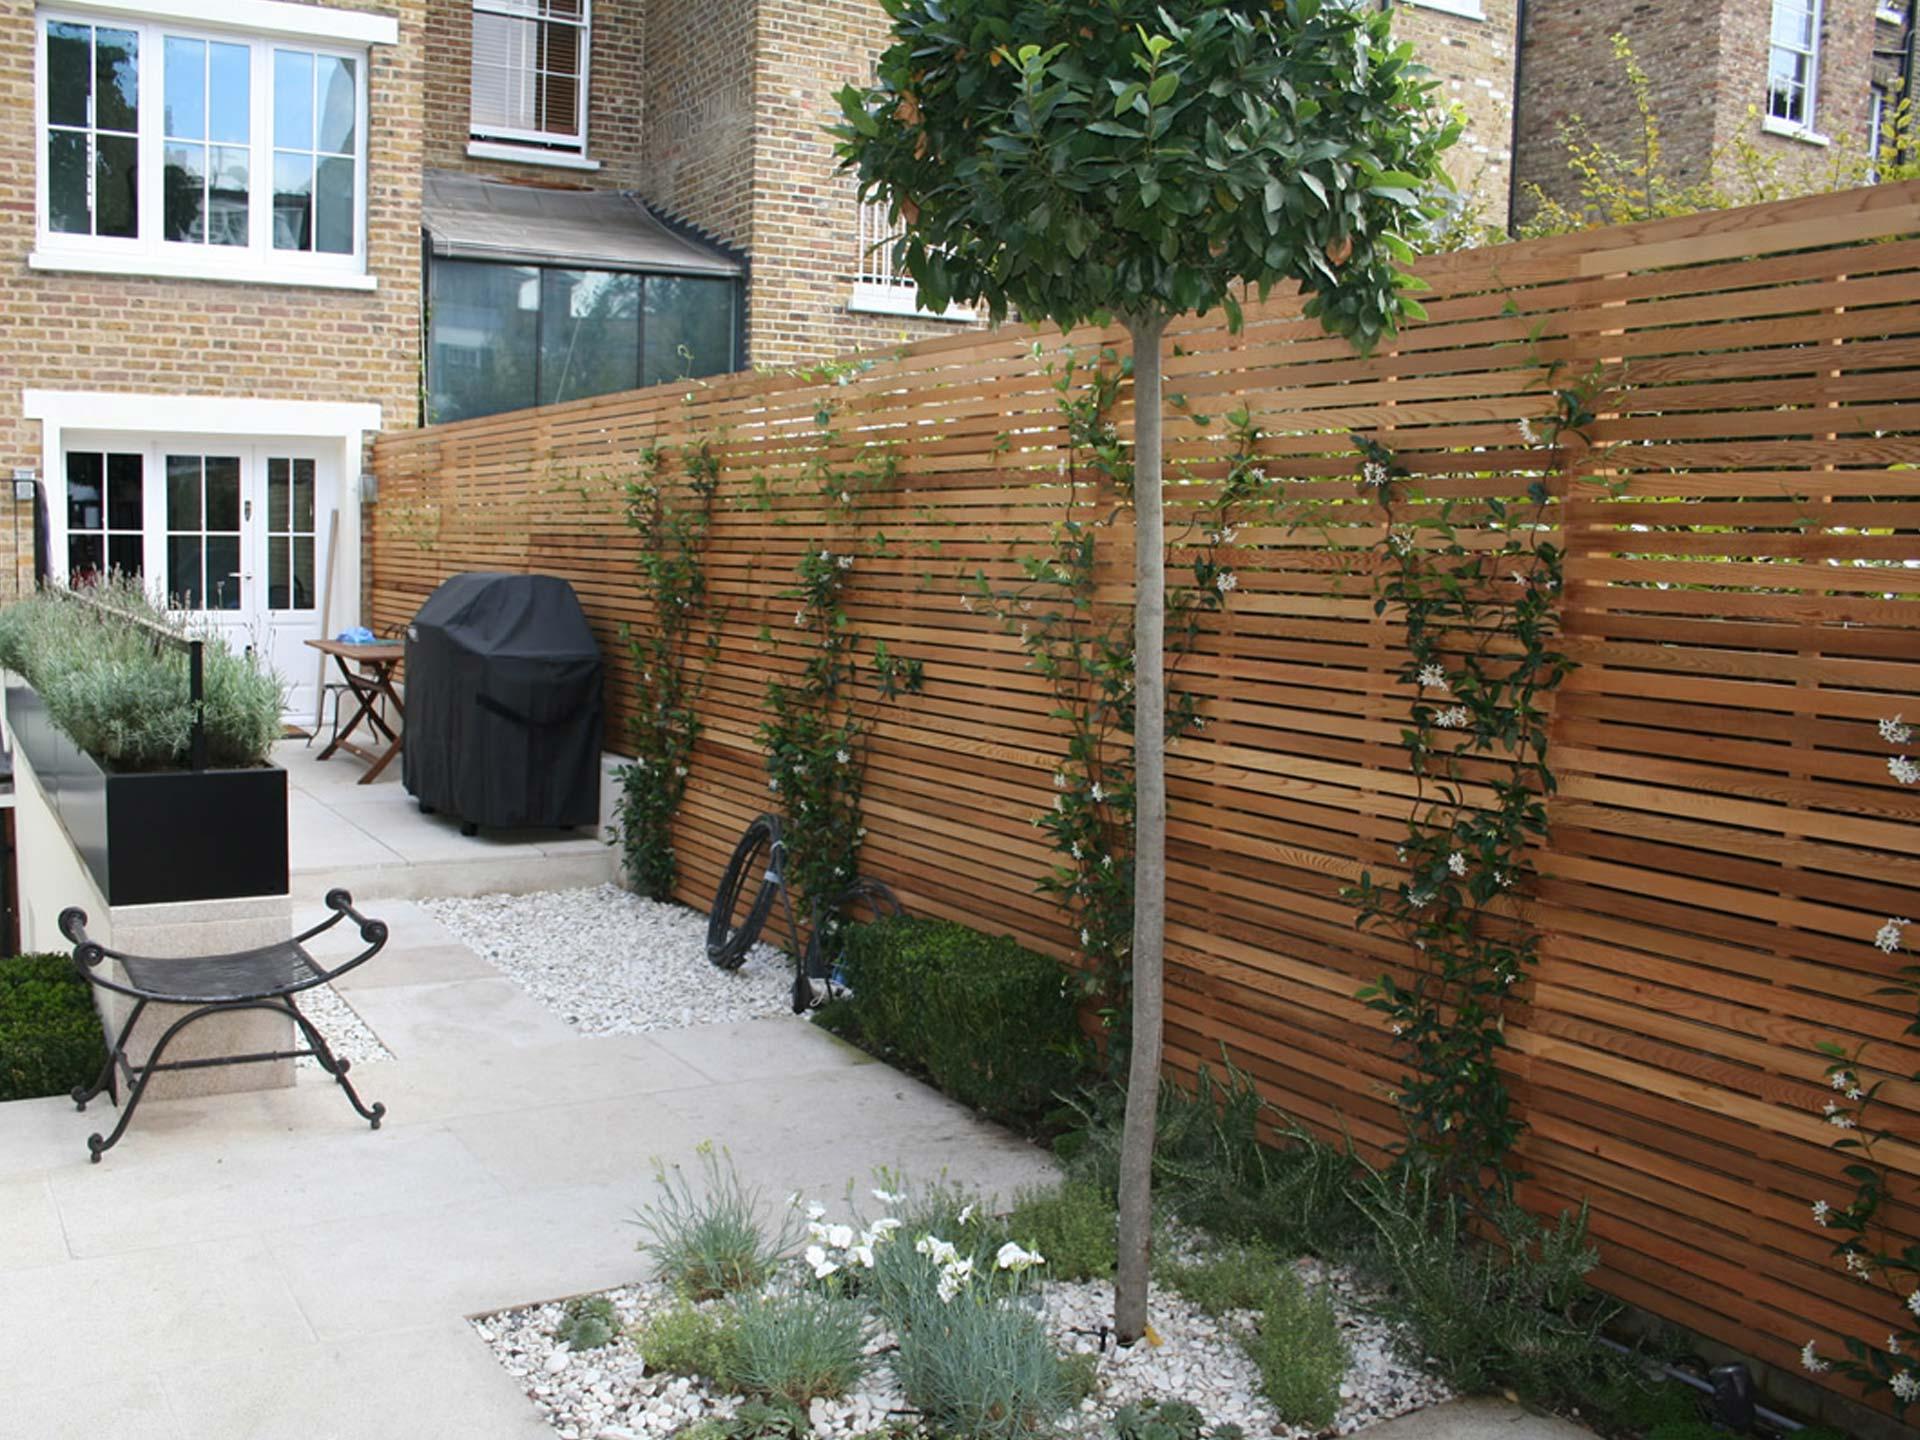 Houten schutting tuin loungeset 2017 for Schutting tuin